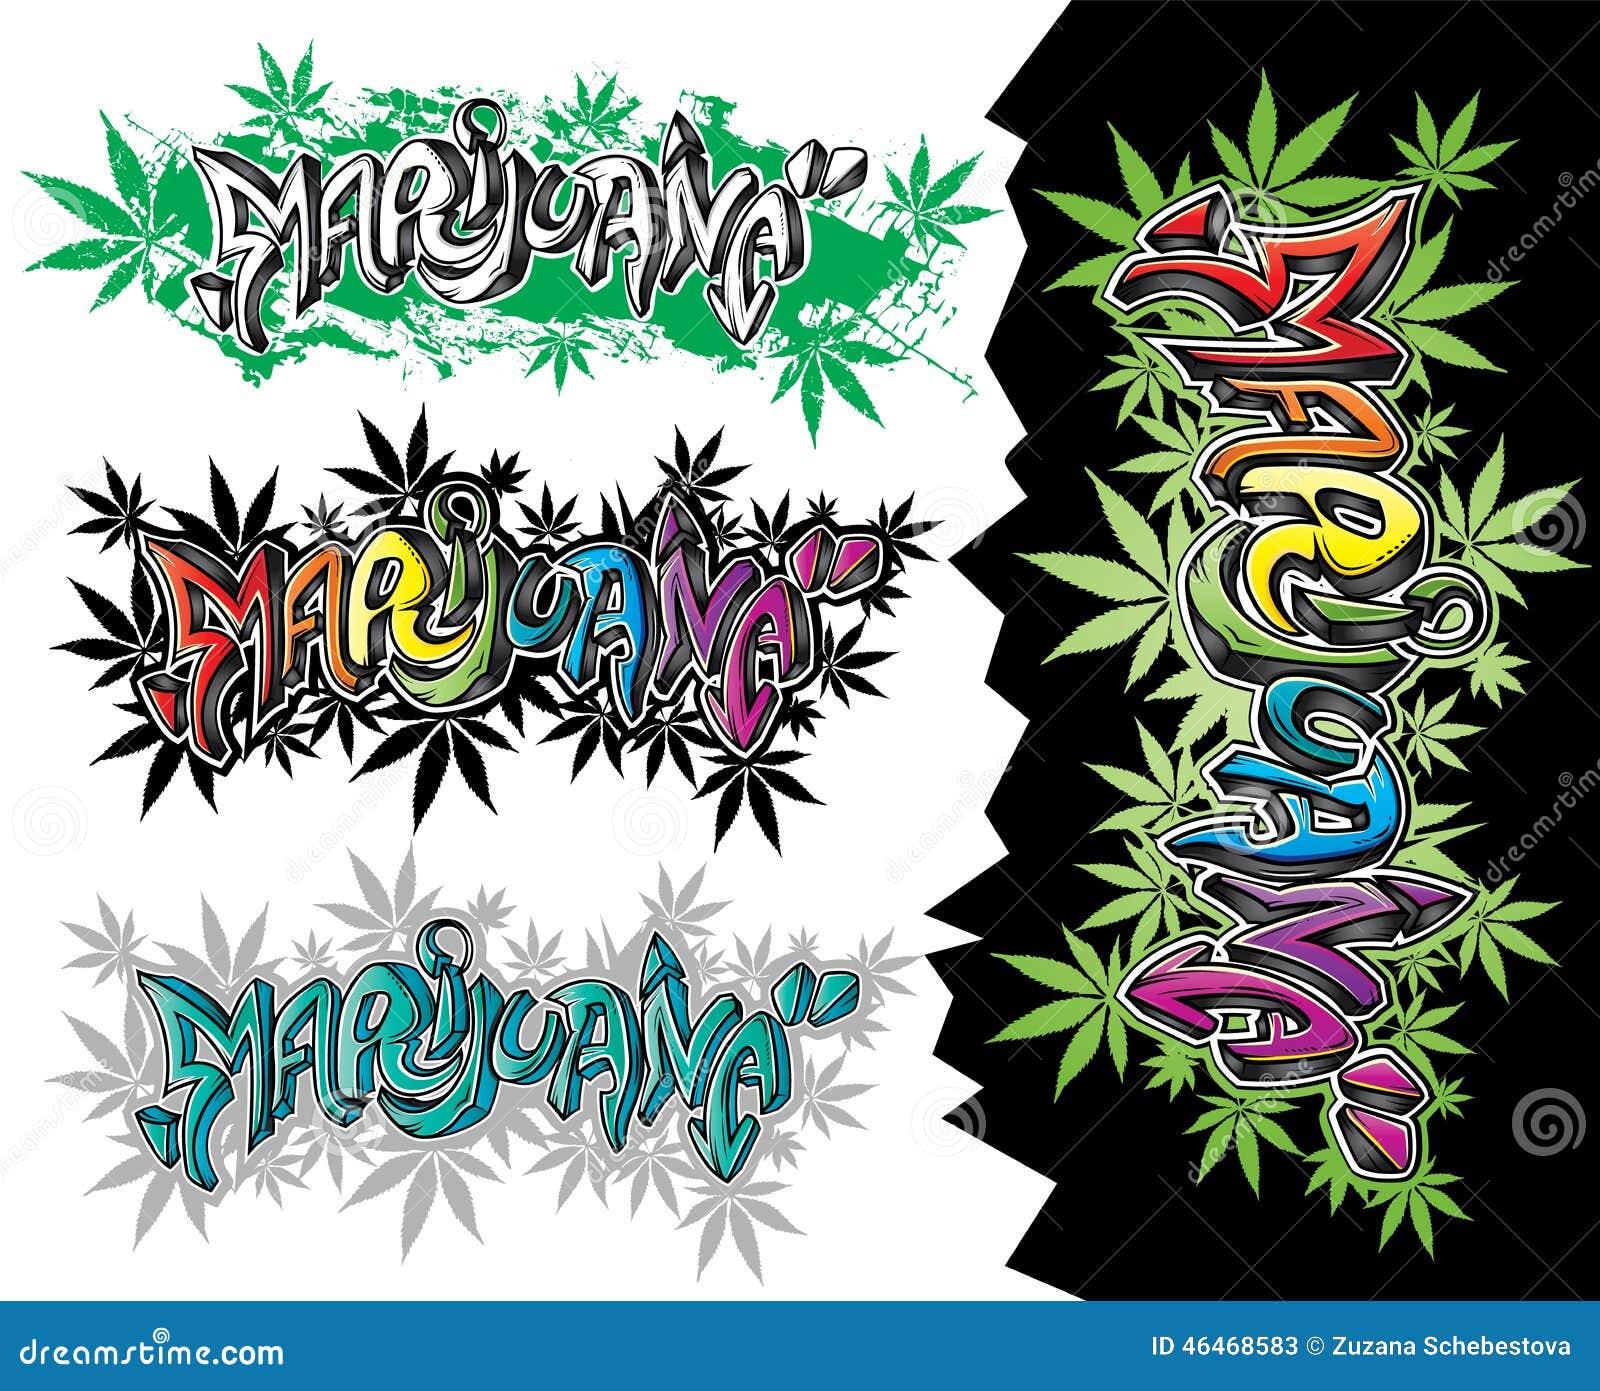 Marijuana weed leaves street graffiti design text stock marijuana weed leaves street graffiti design text biocorpaavc